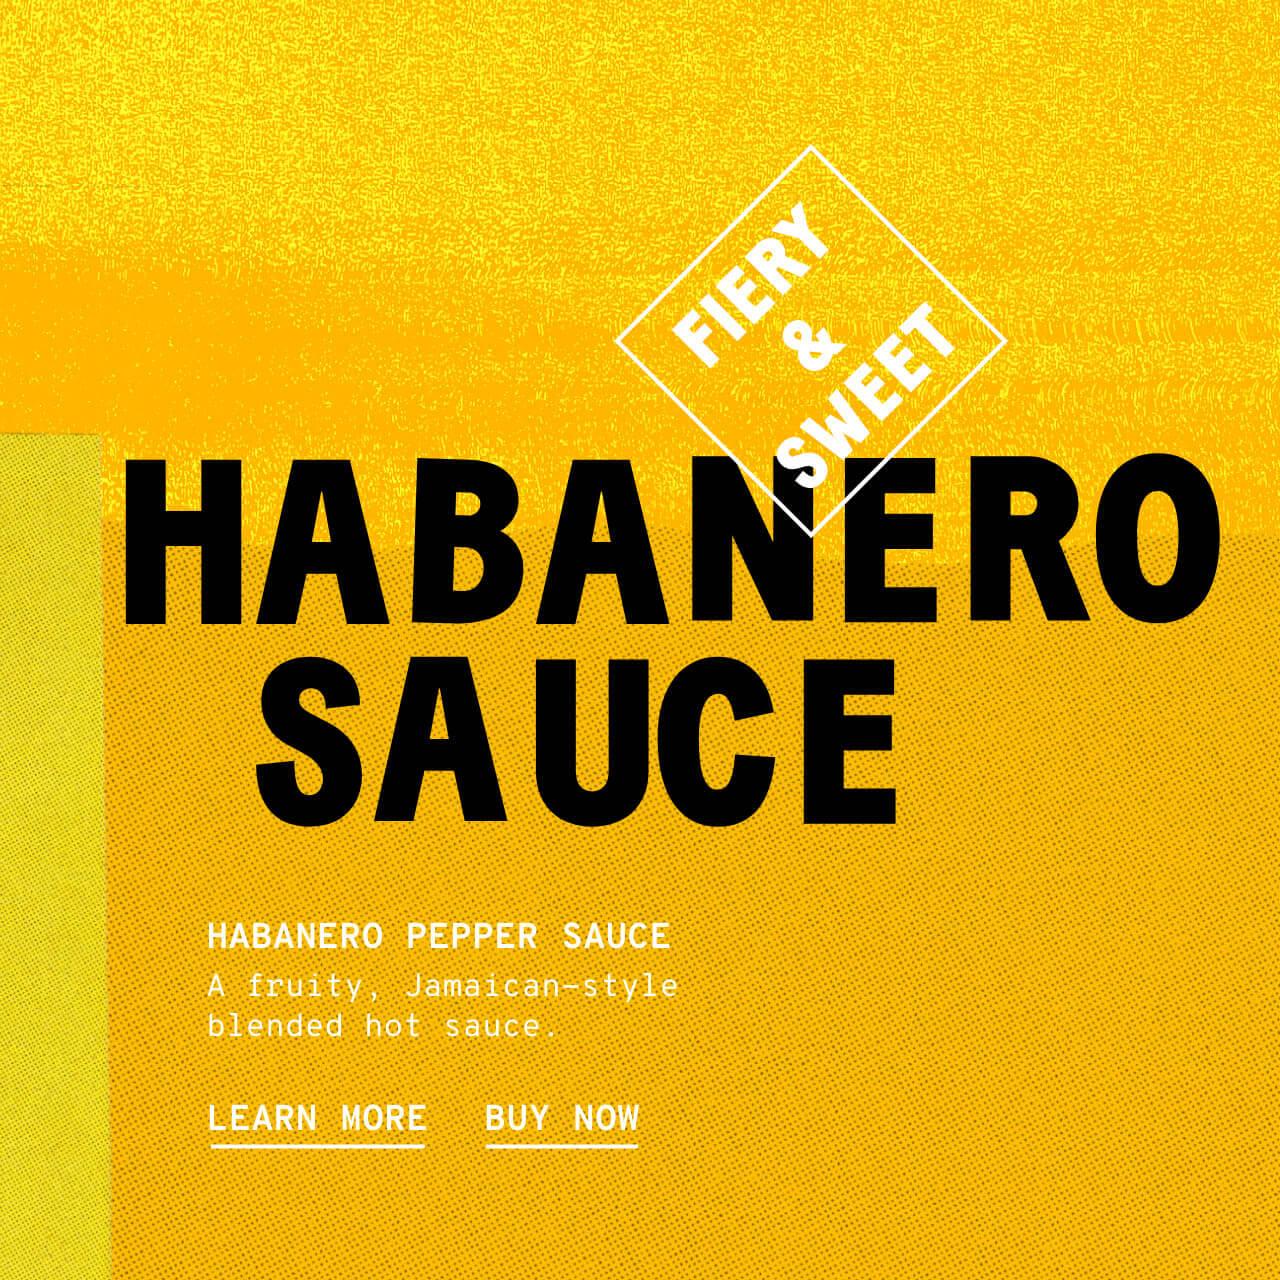 Habanero Pepper Sauce - Description